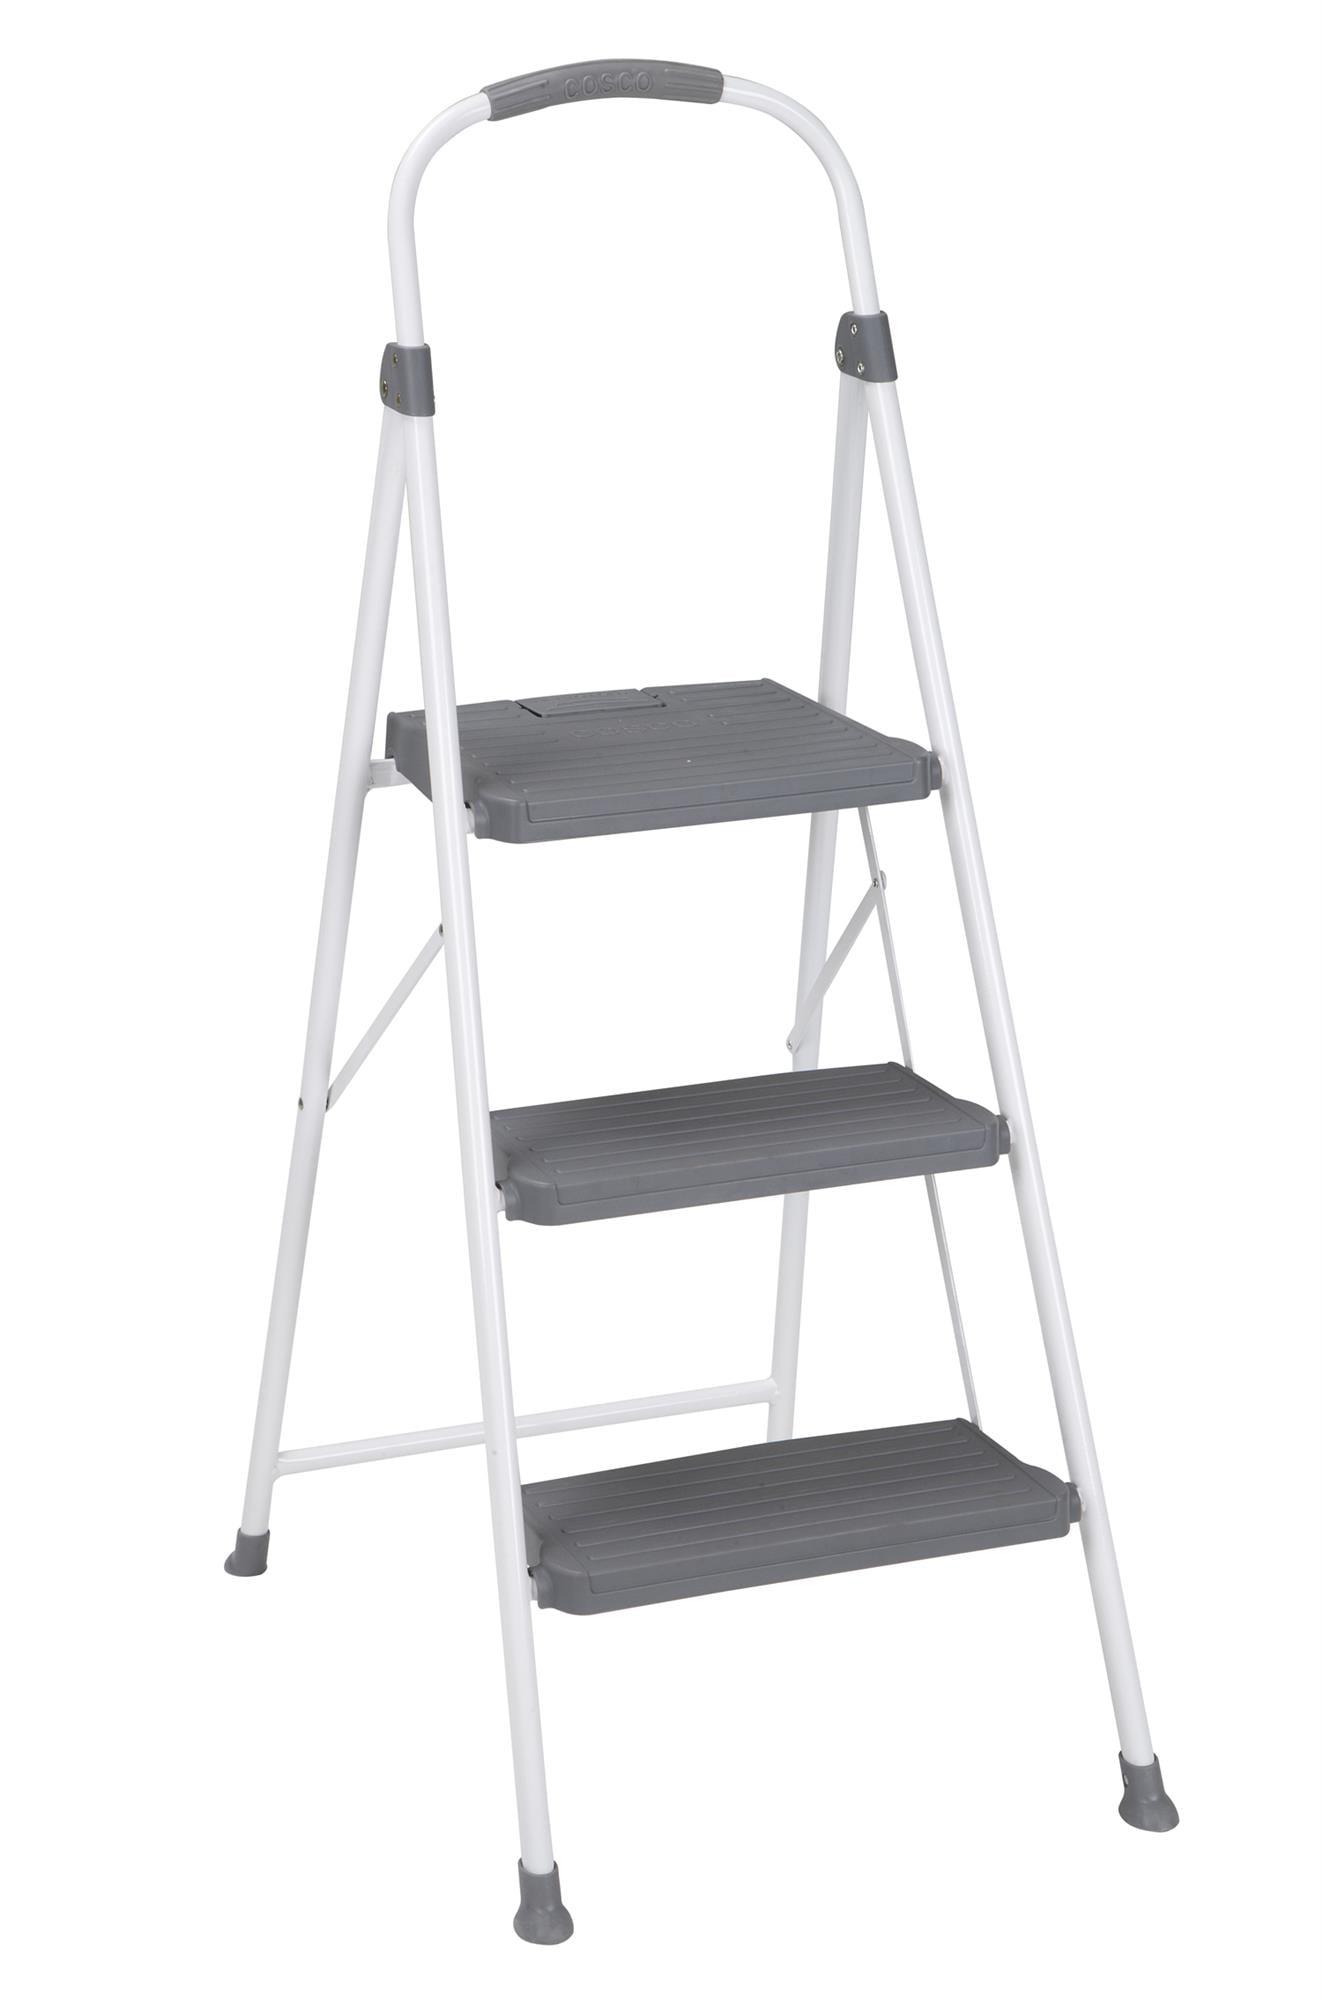 Incredible Cosco 3 Step Premium Stool Large Step Grey Walmart Creativecarmelina Interior Chair Design Creativecarmelinacom